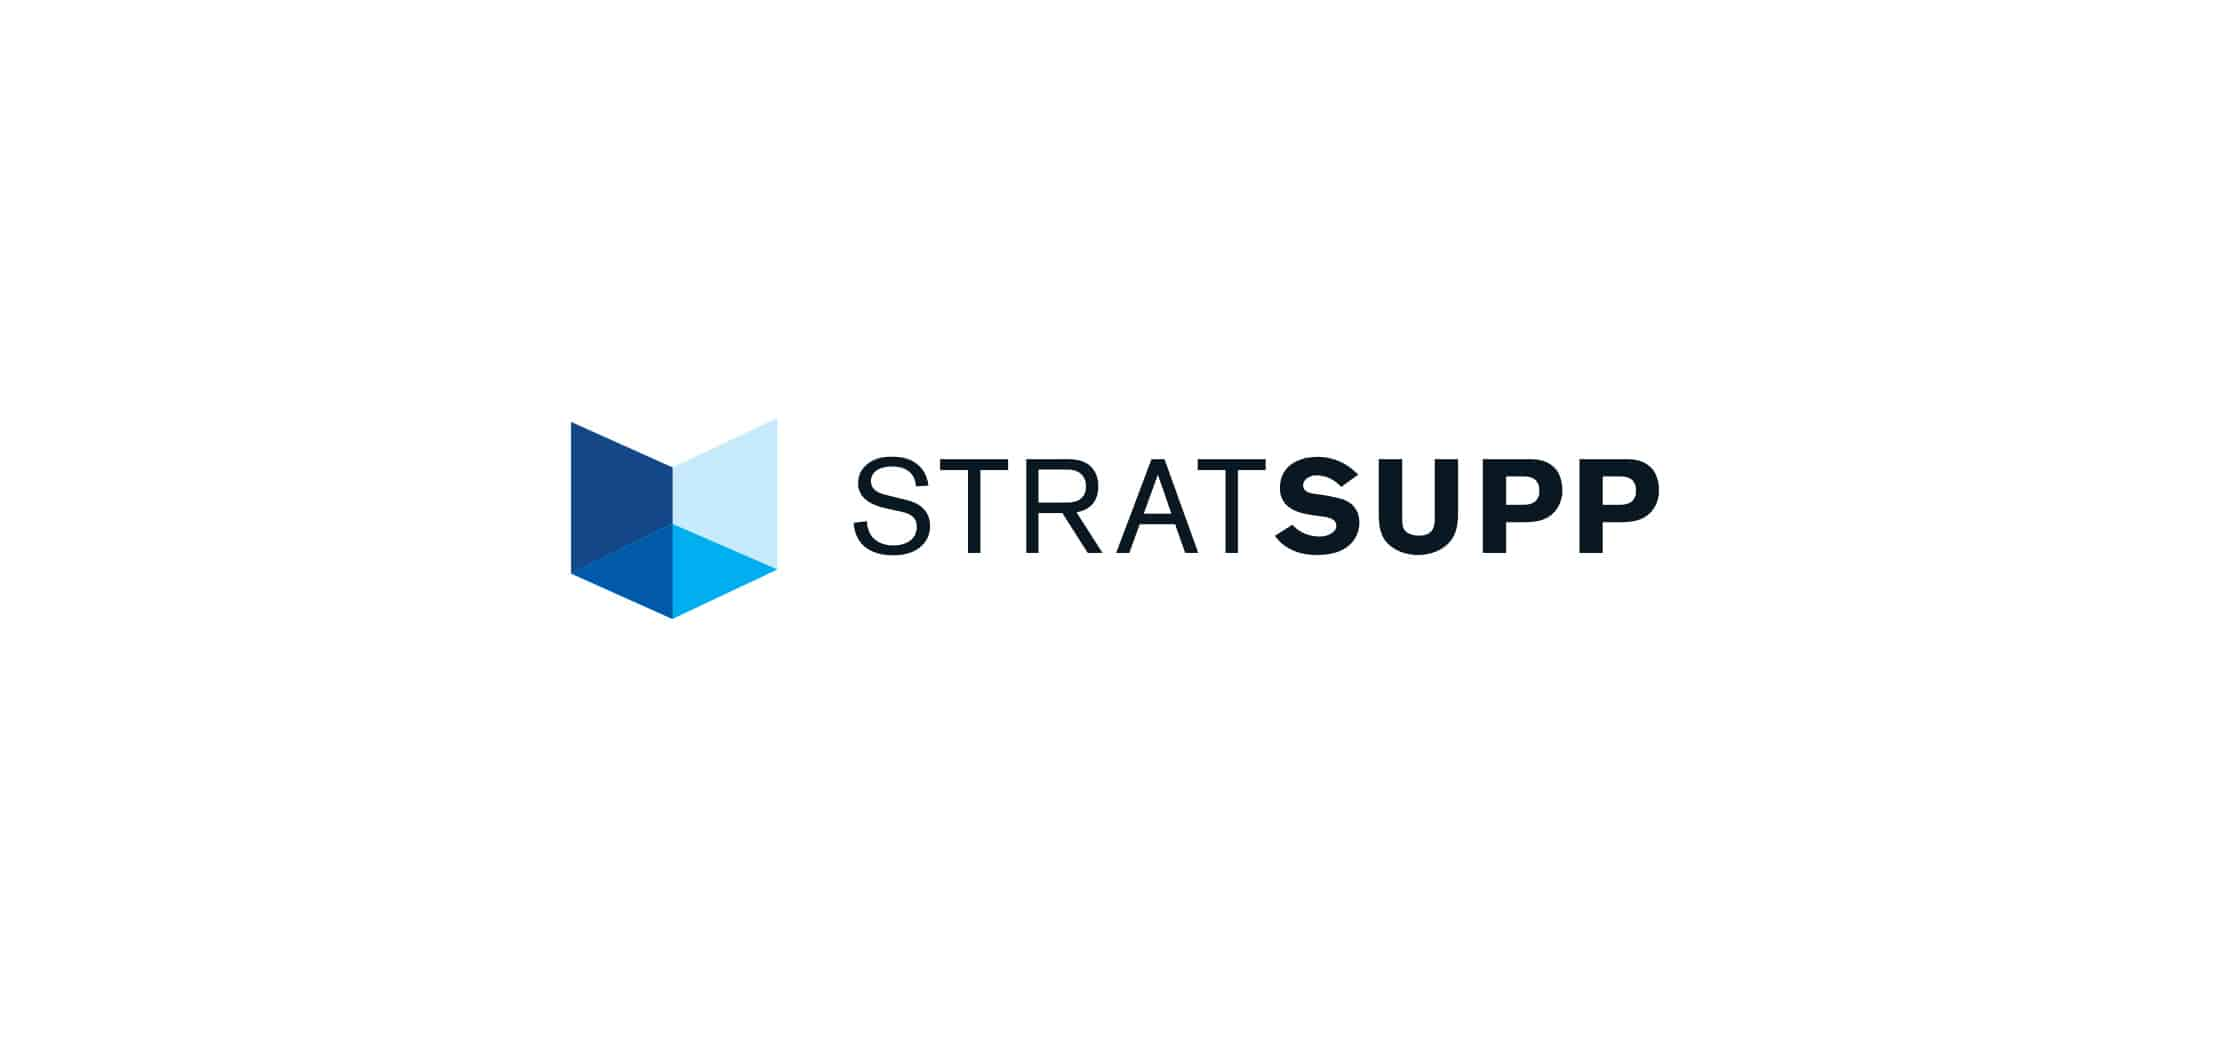 stratsupp-logo-fullwidth